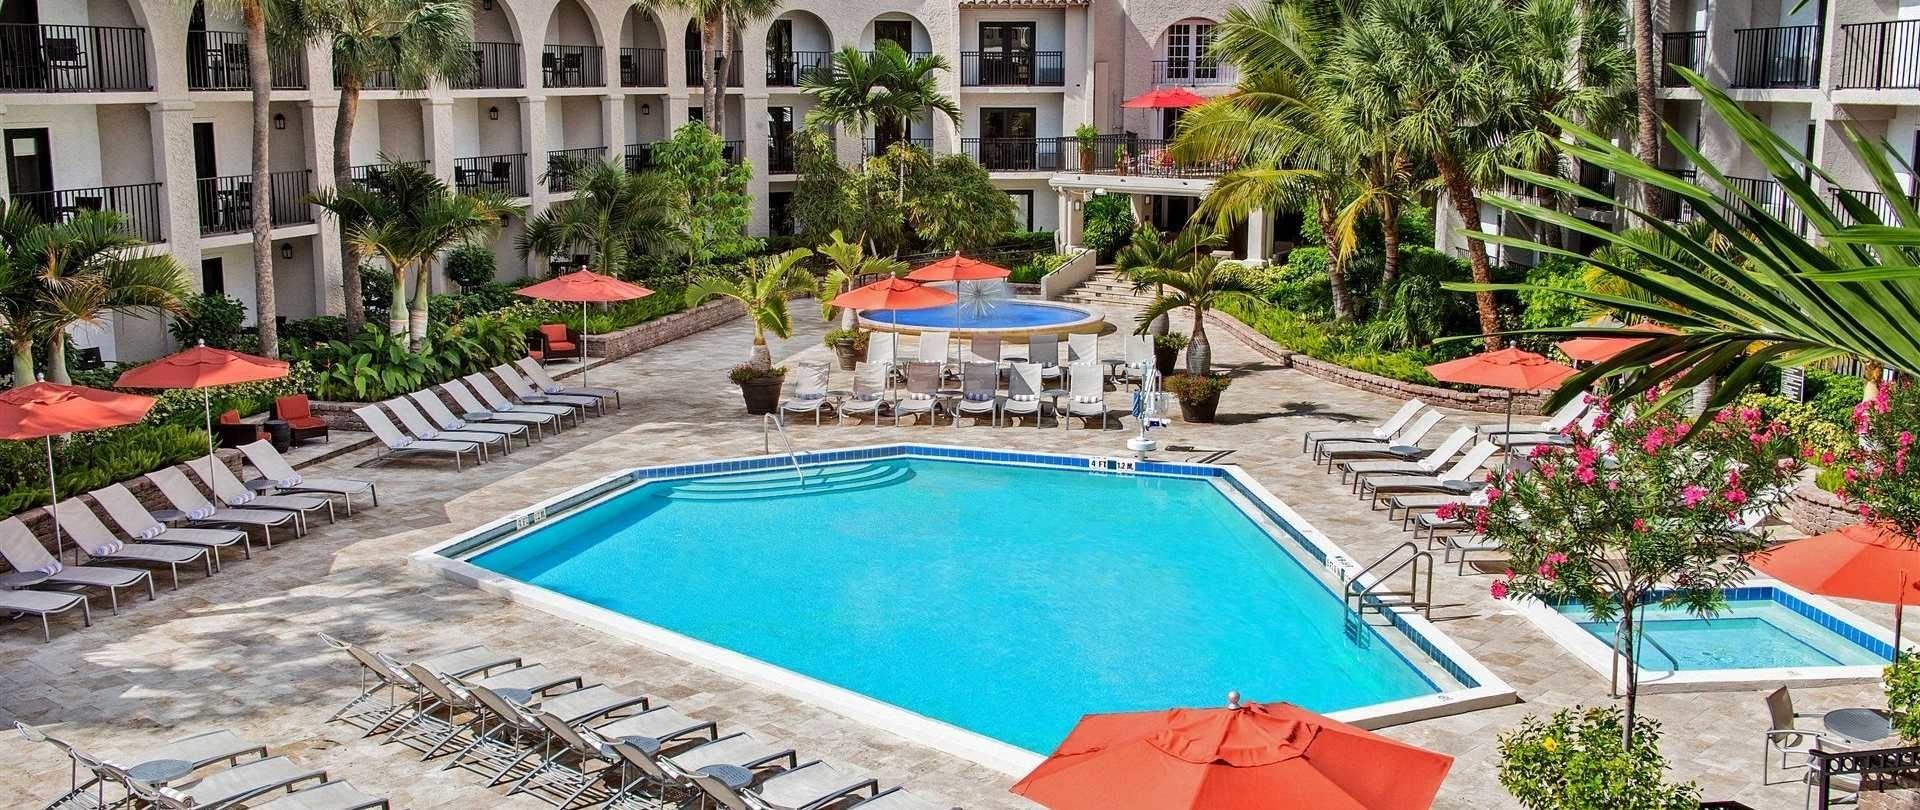 Hotel In Boca Raton Florida Wyndham Boca Raton